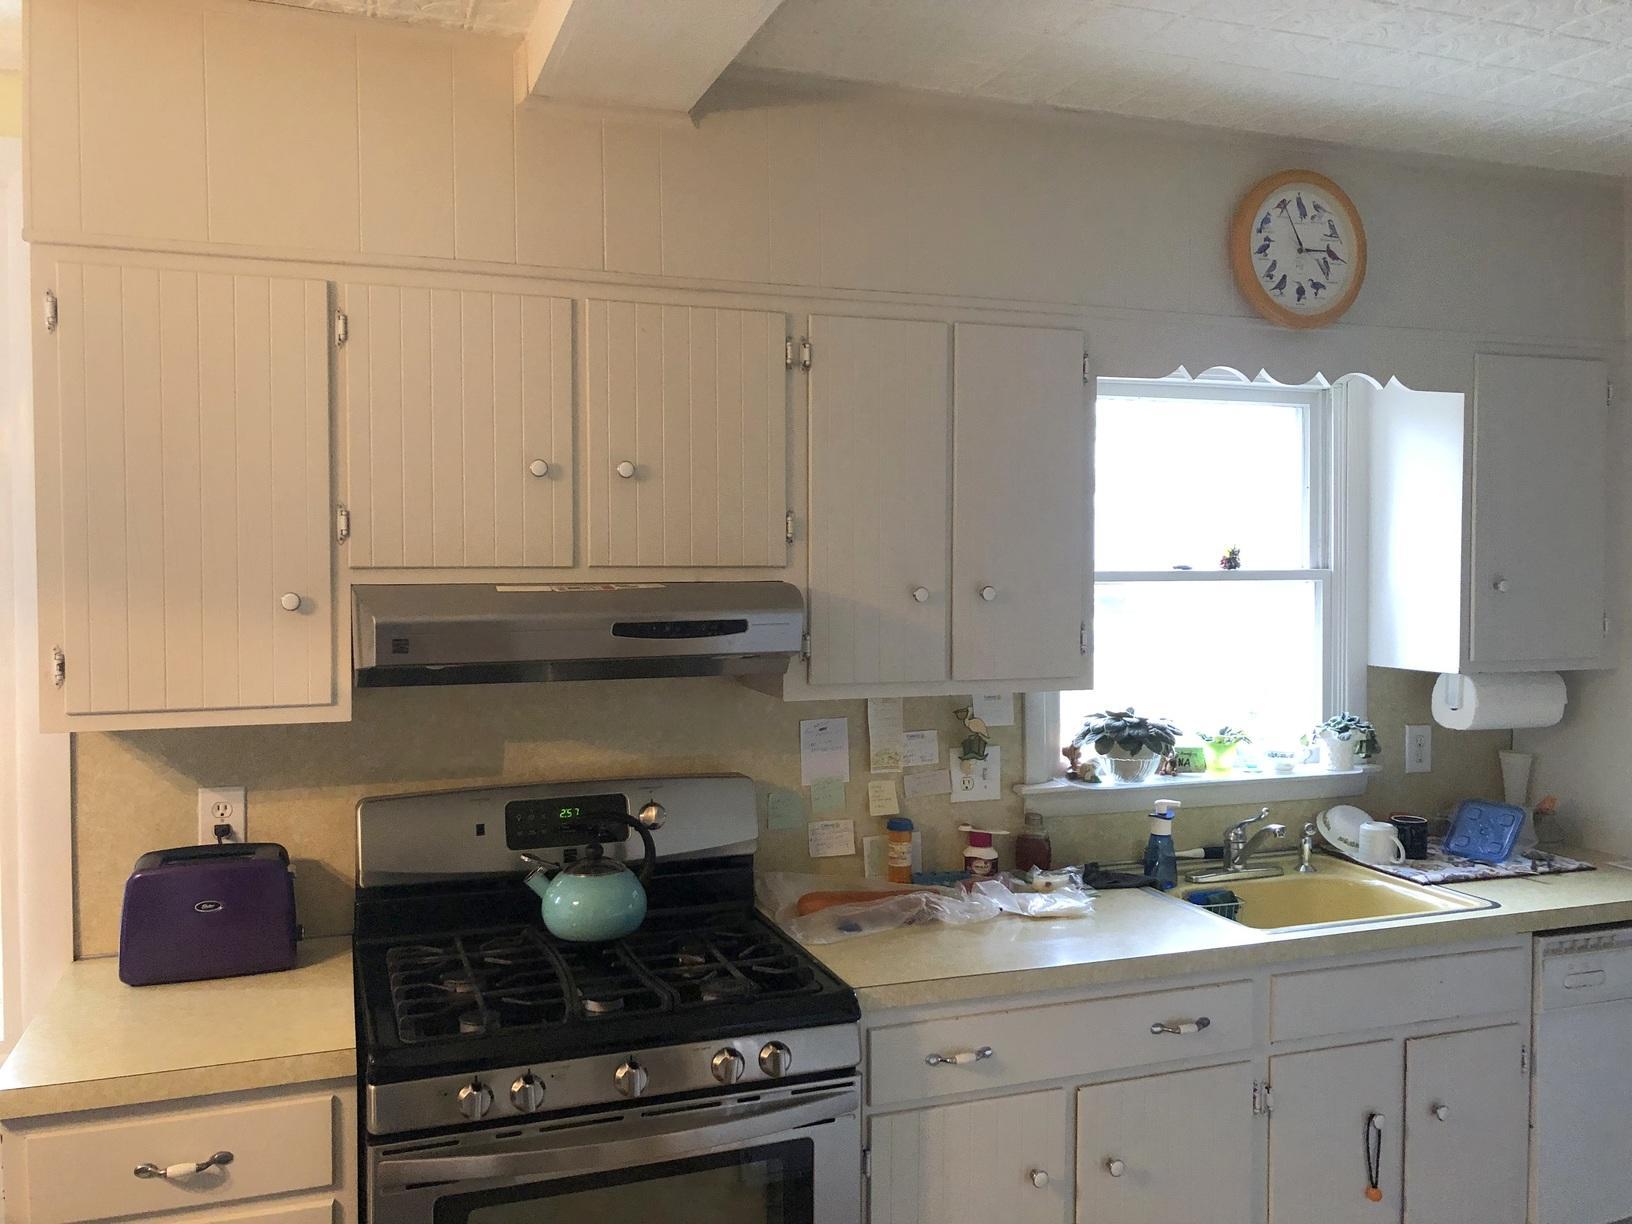 Kitchen Refacing in Horsham - Before Photo